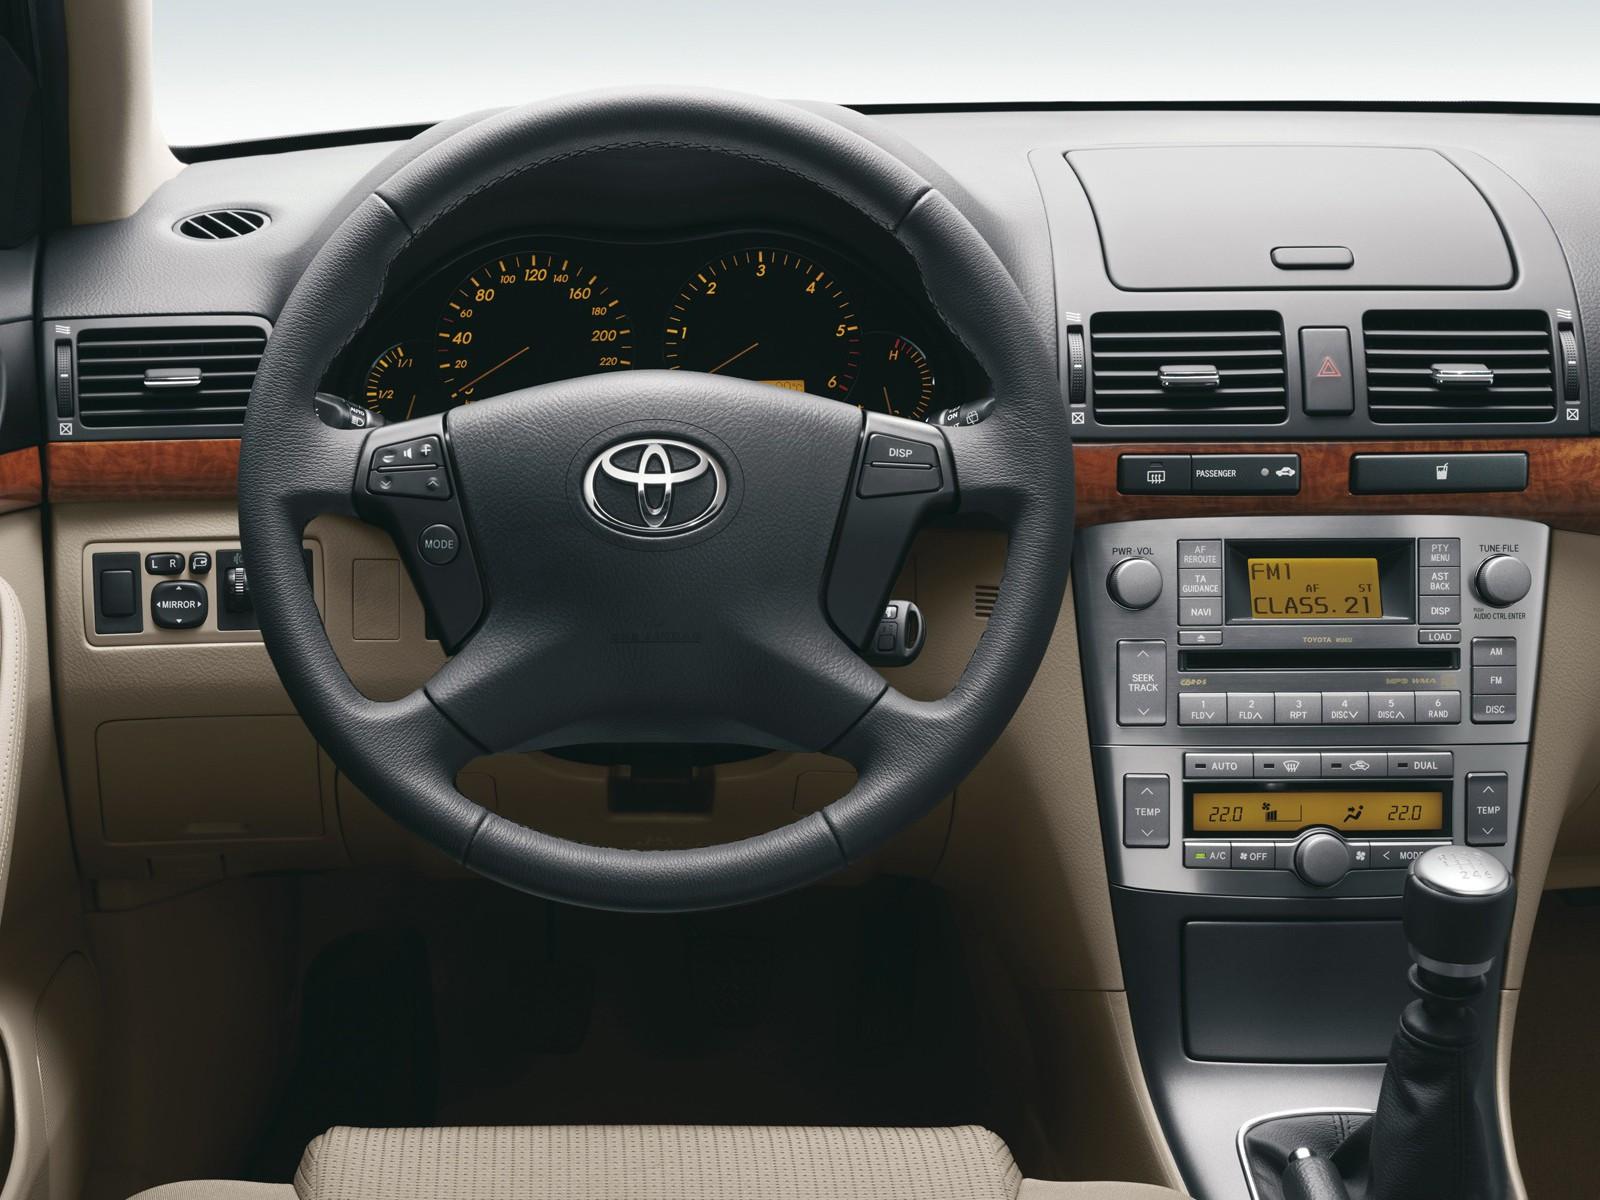 TOYOTA Avensis 2003 2004 2005 2006 Autoevolution